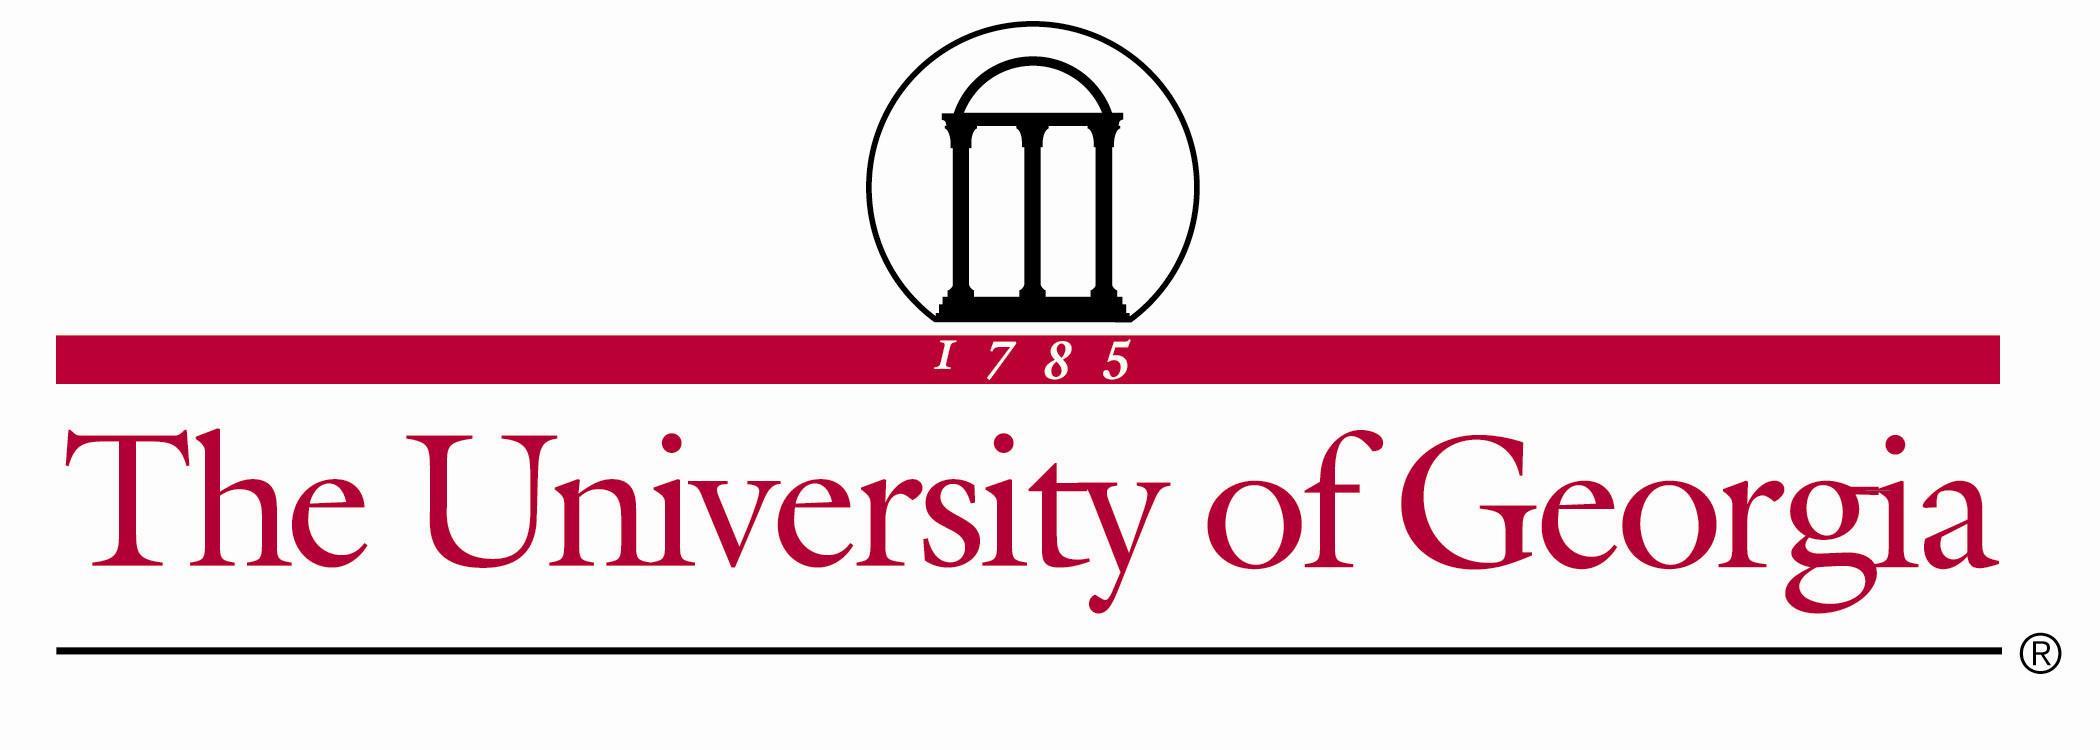 University of Georgia Esports Association to host Athens Online